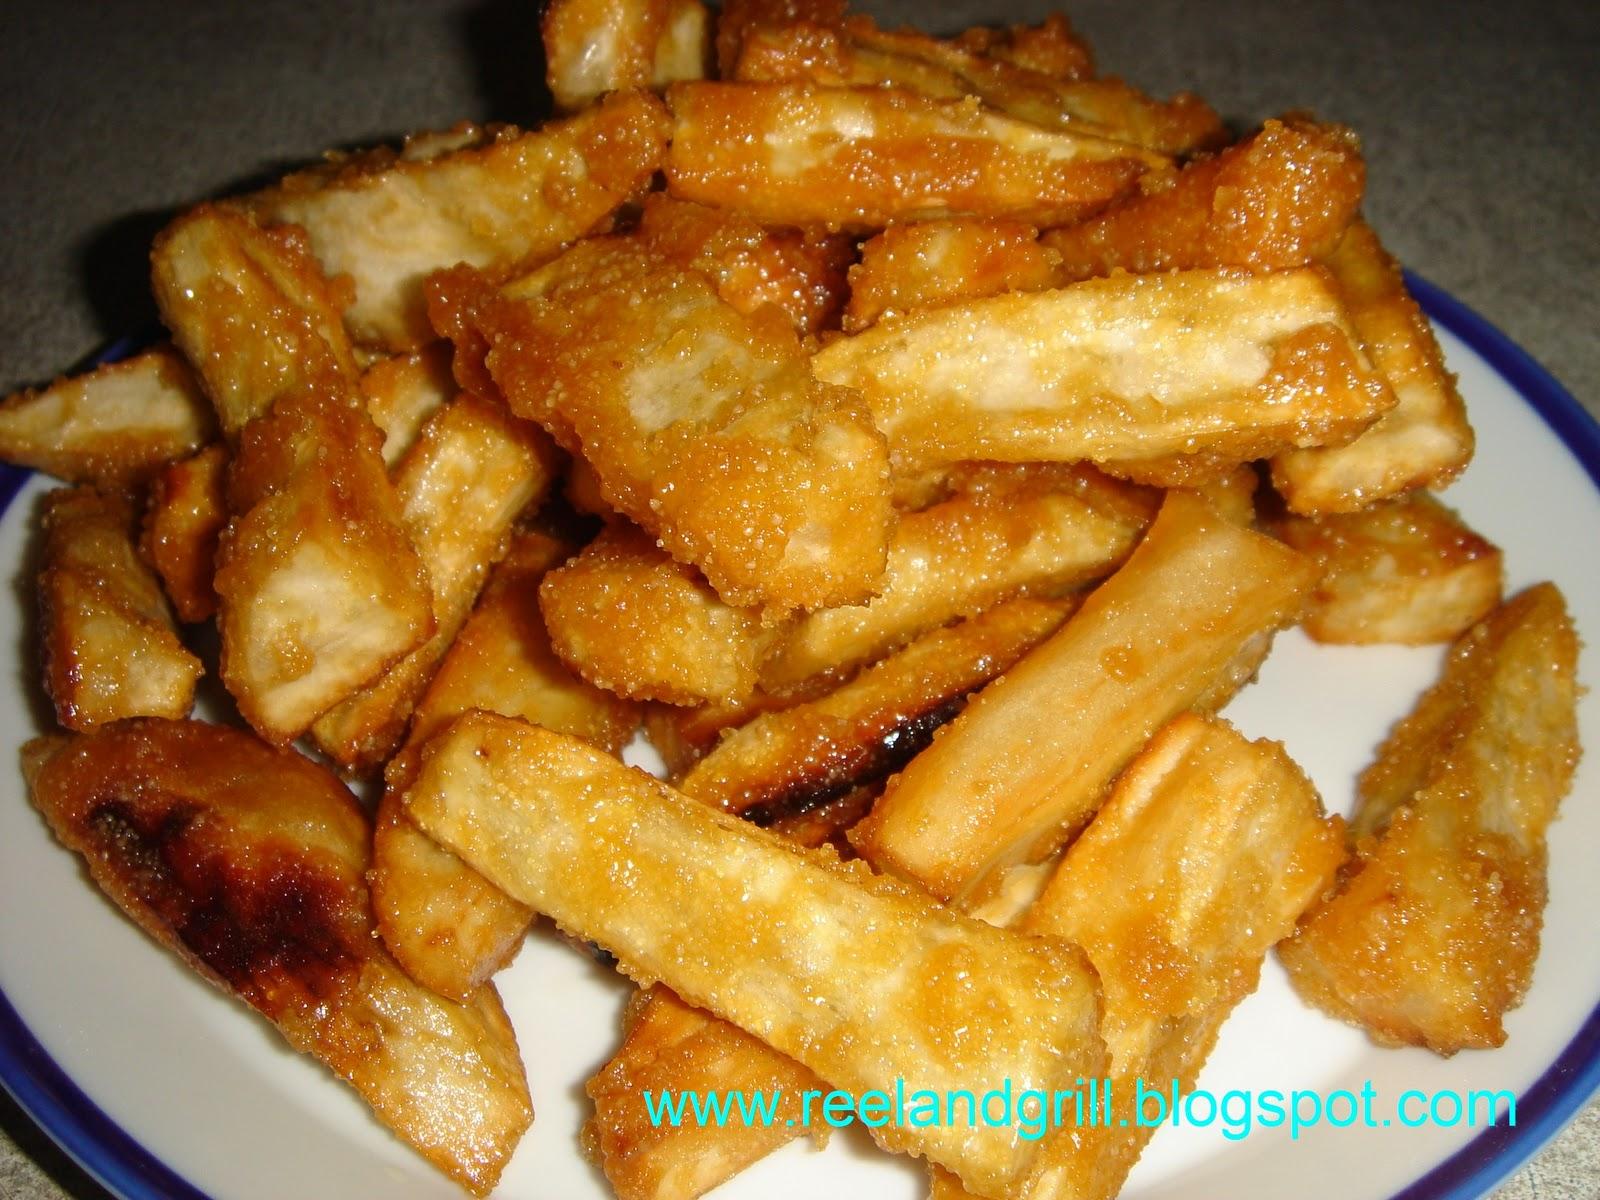 ... fried sweet potatoes deep fried sweet potato and sweet potato banana